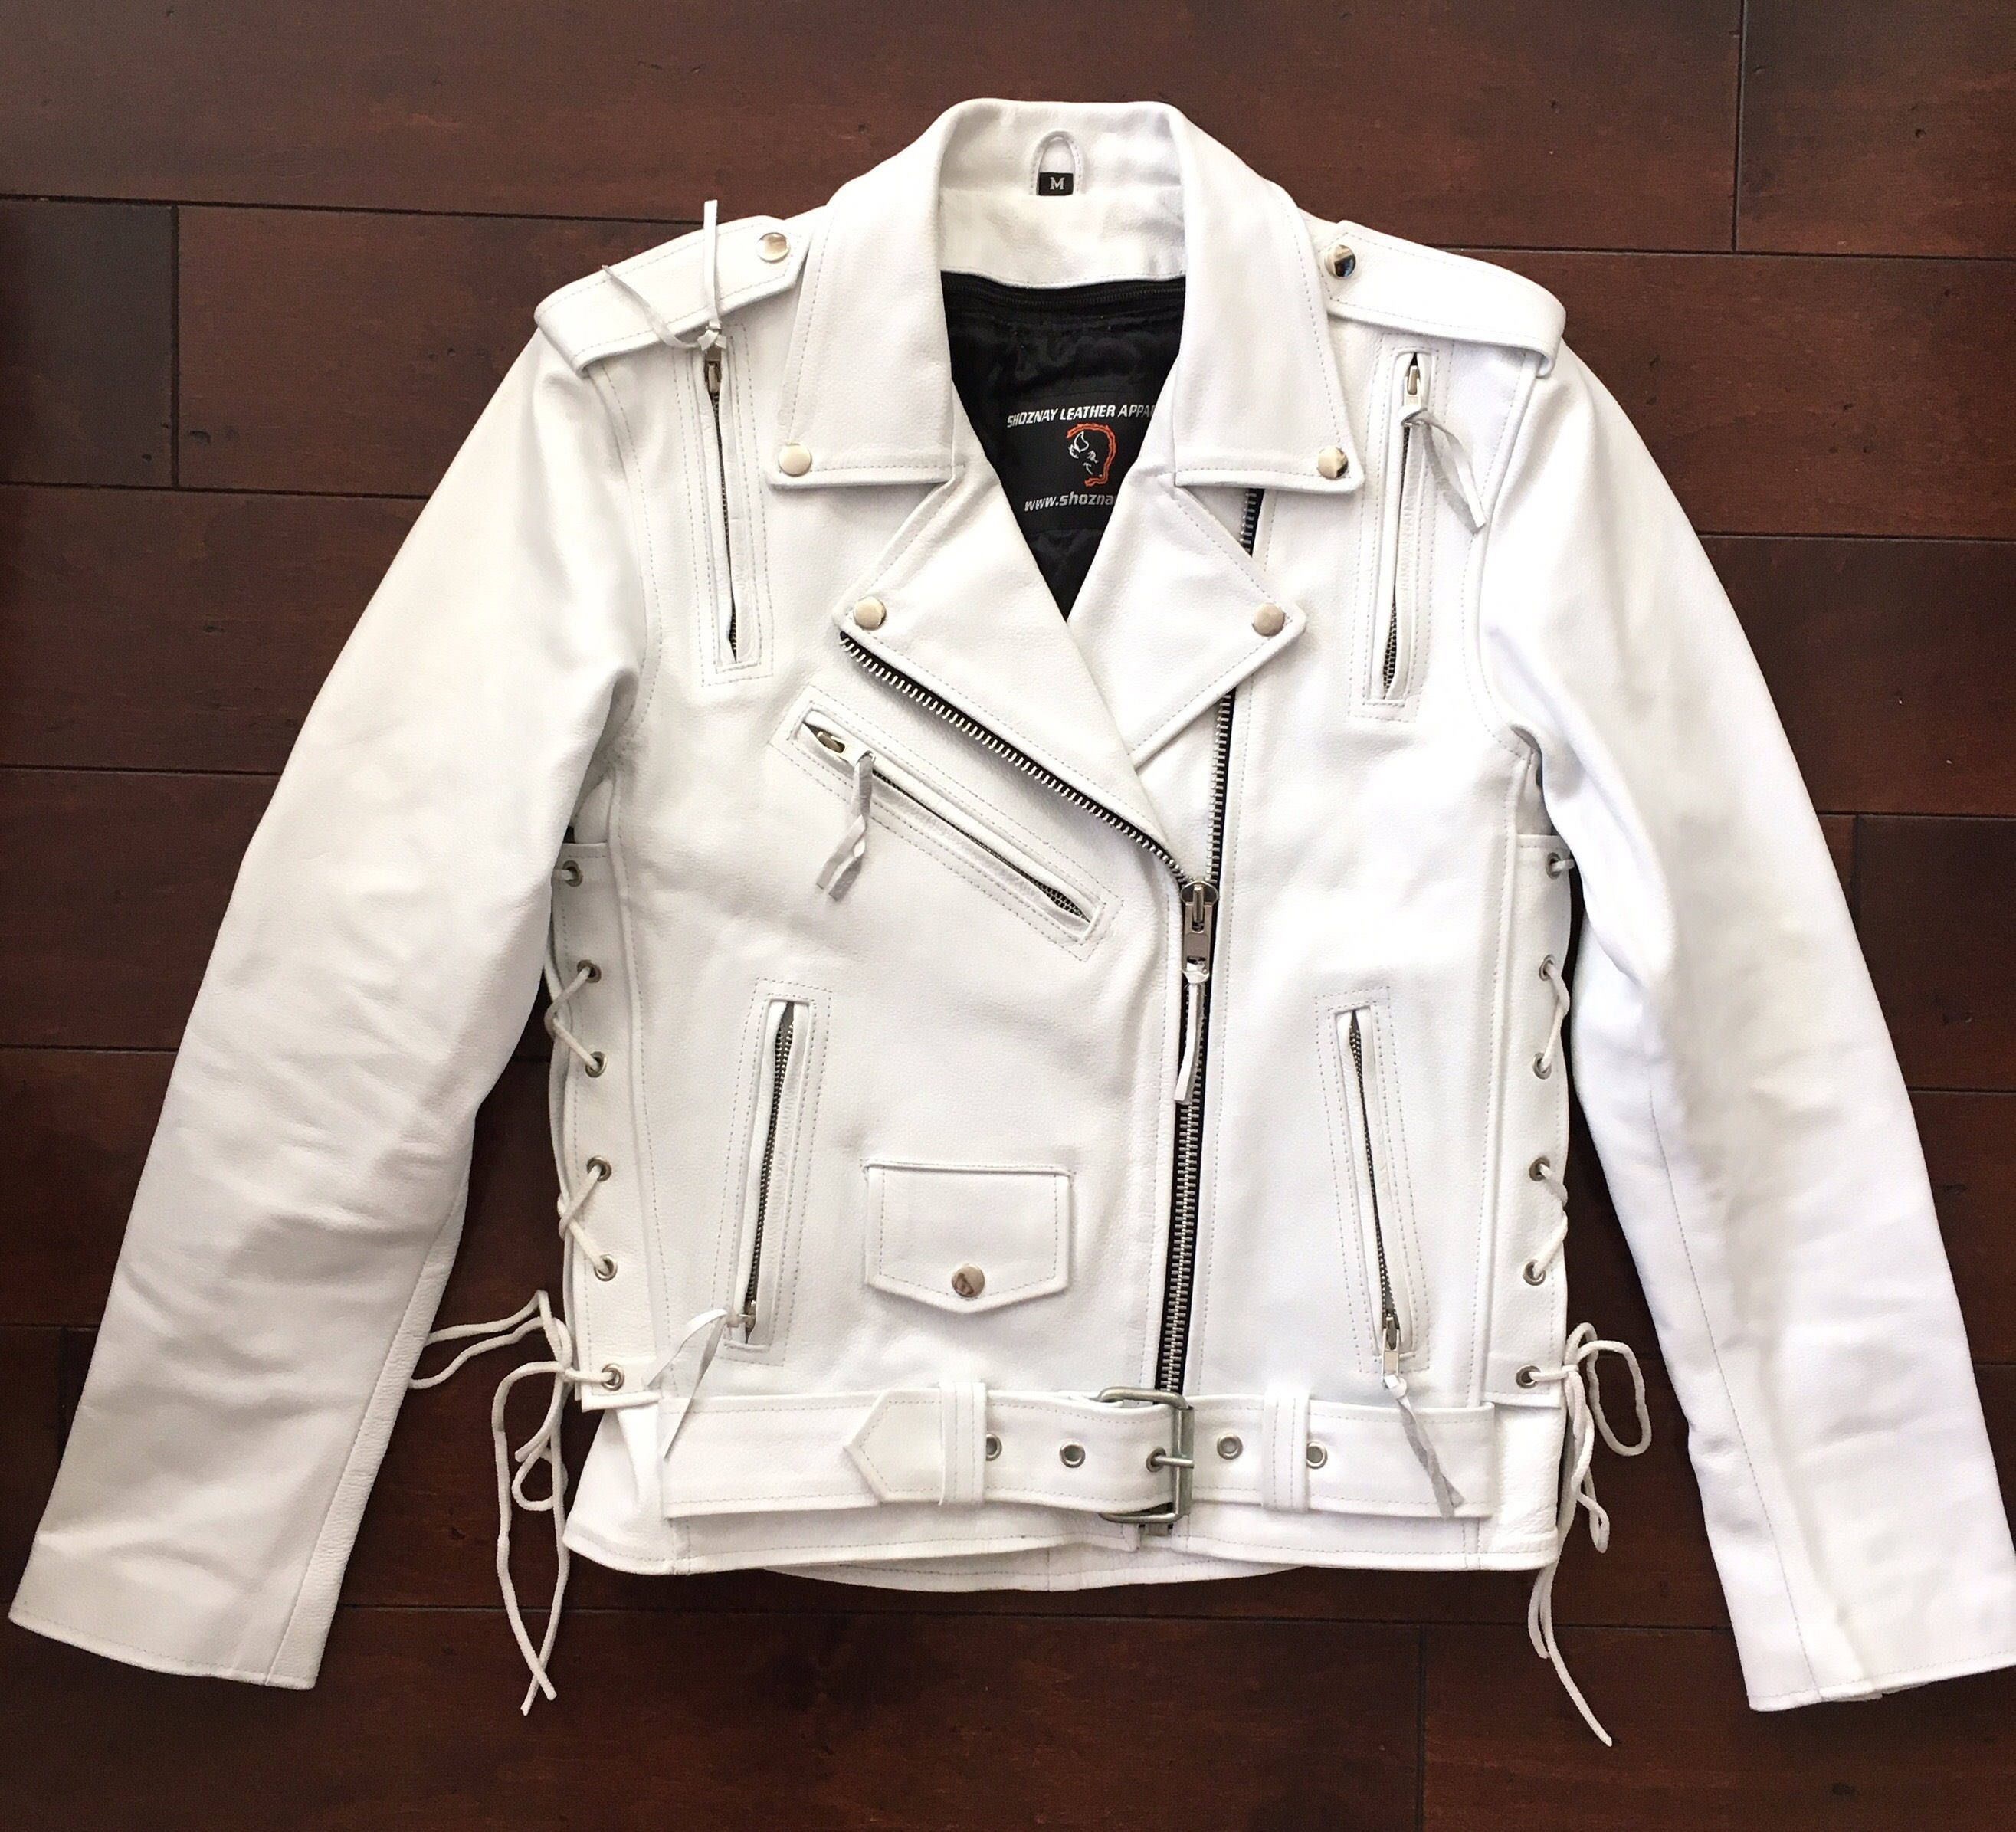 c0c9c68b3 Vtg White Leather Jacket womens L / XL biker moto vintage gorgeous mens  medium zip up zippers pockets corset Shoznay fully lined safe sale by ...